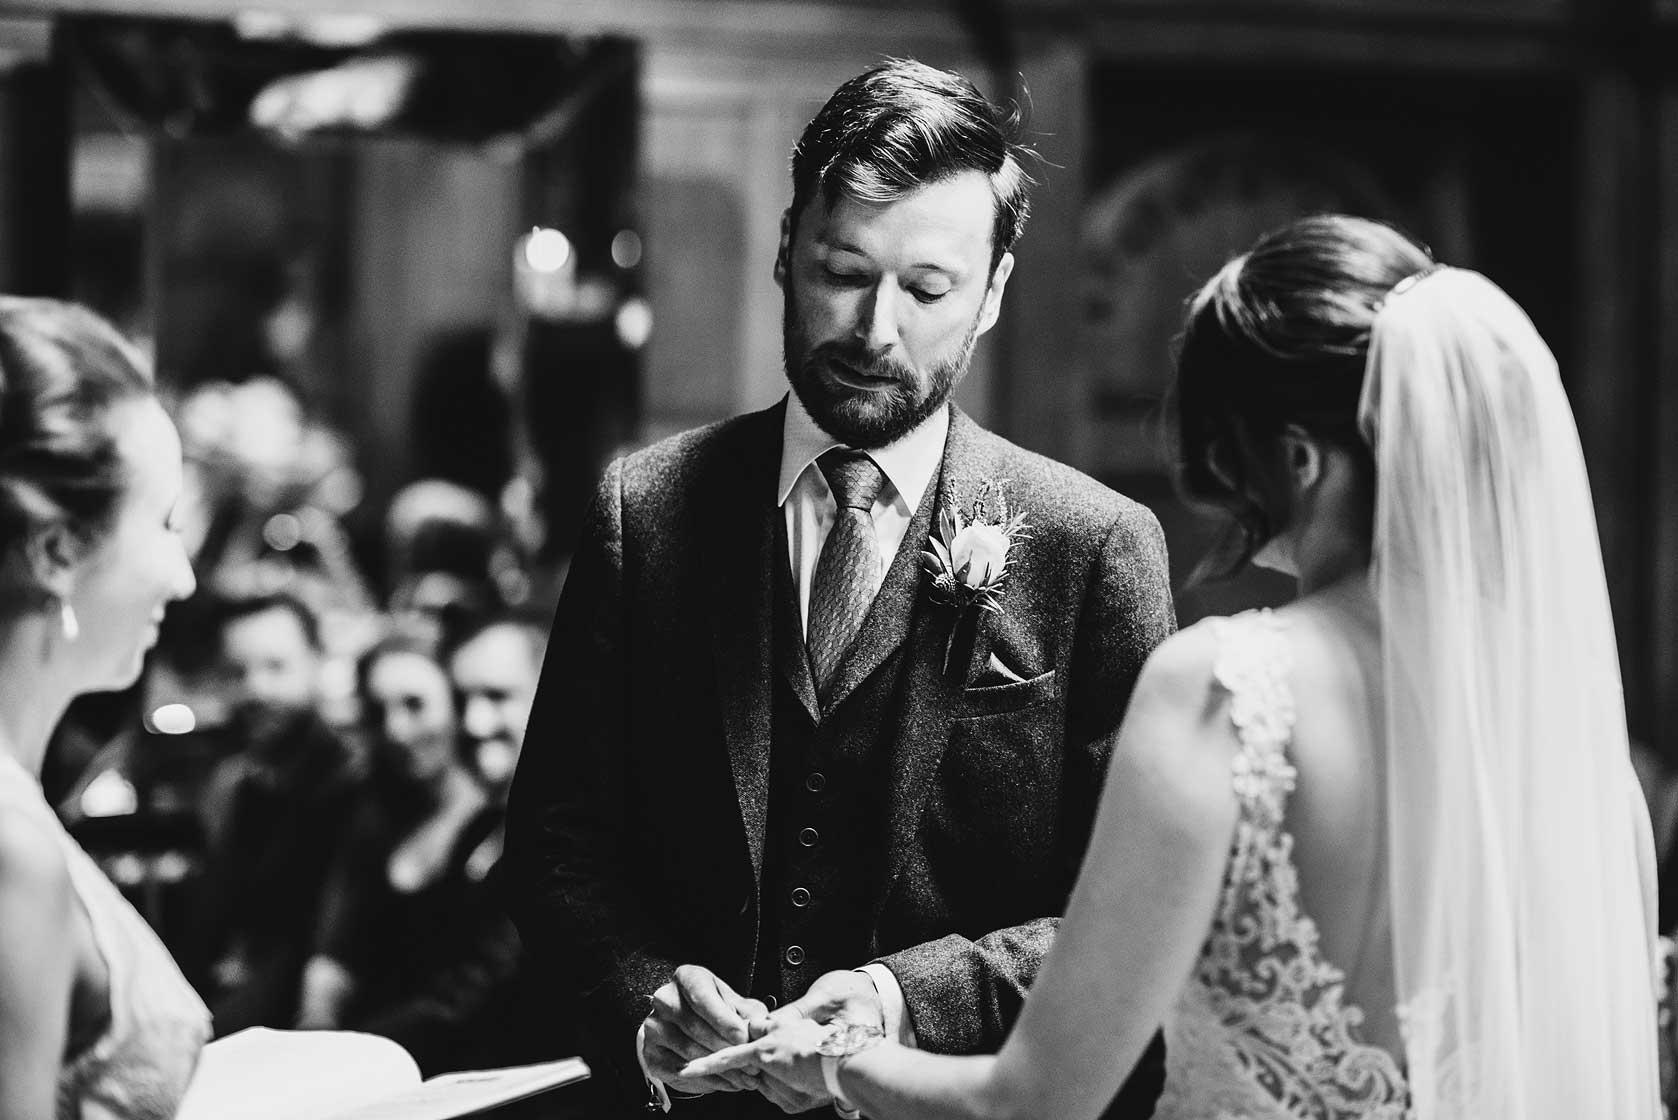 Reportage Wedding Photography at Thornbridge Hall